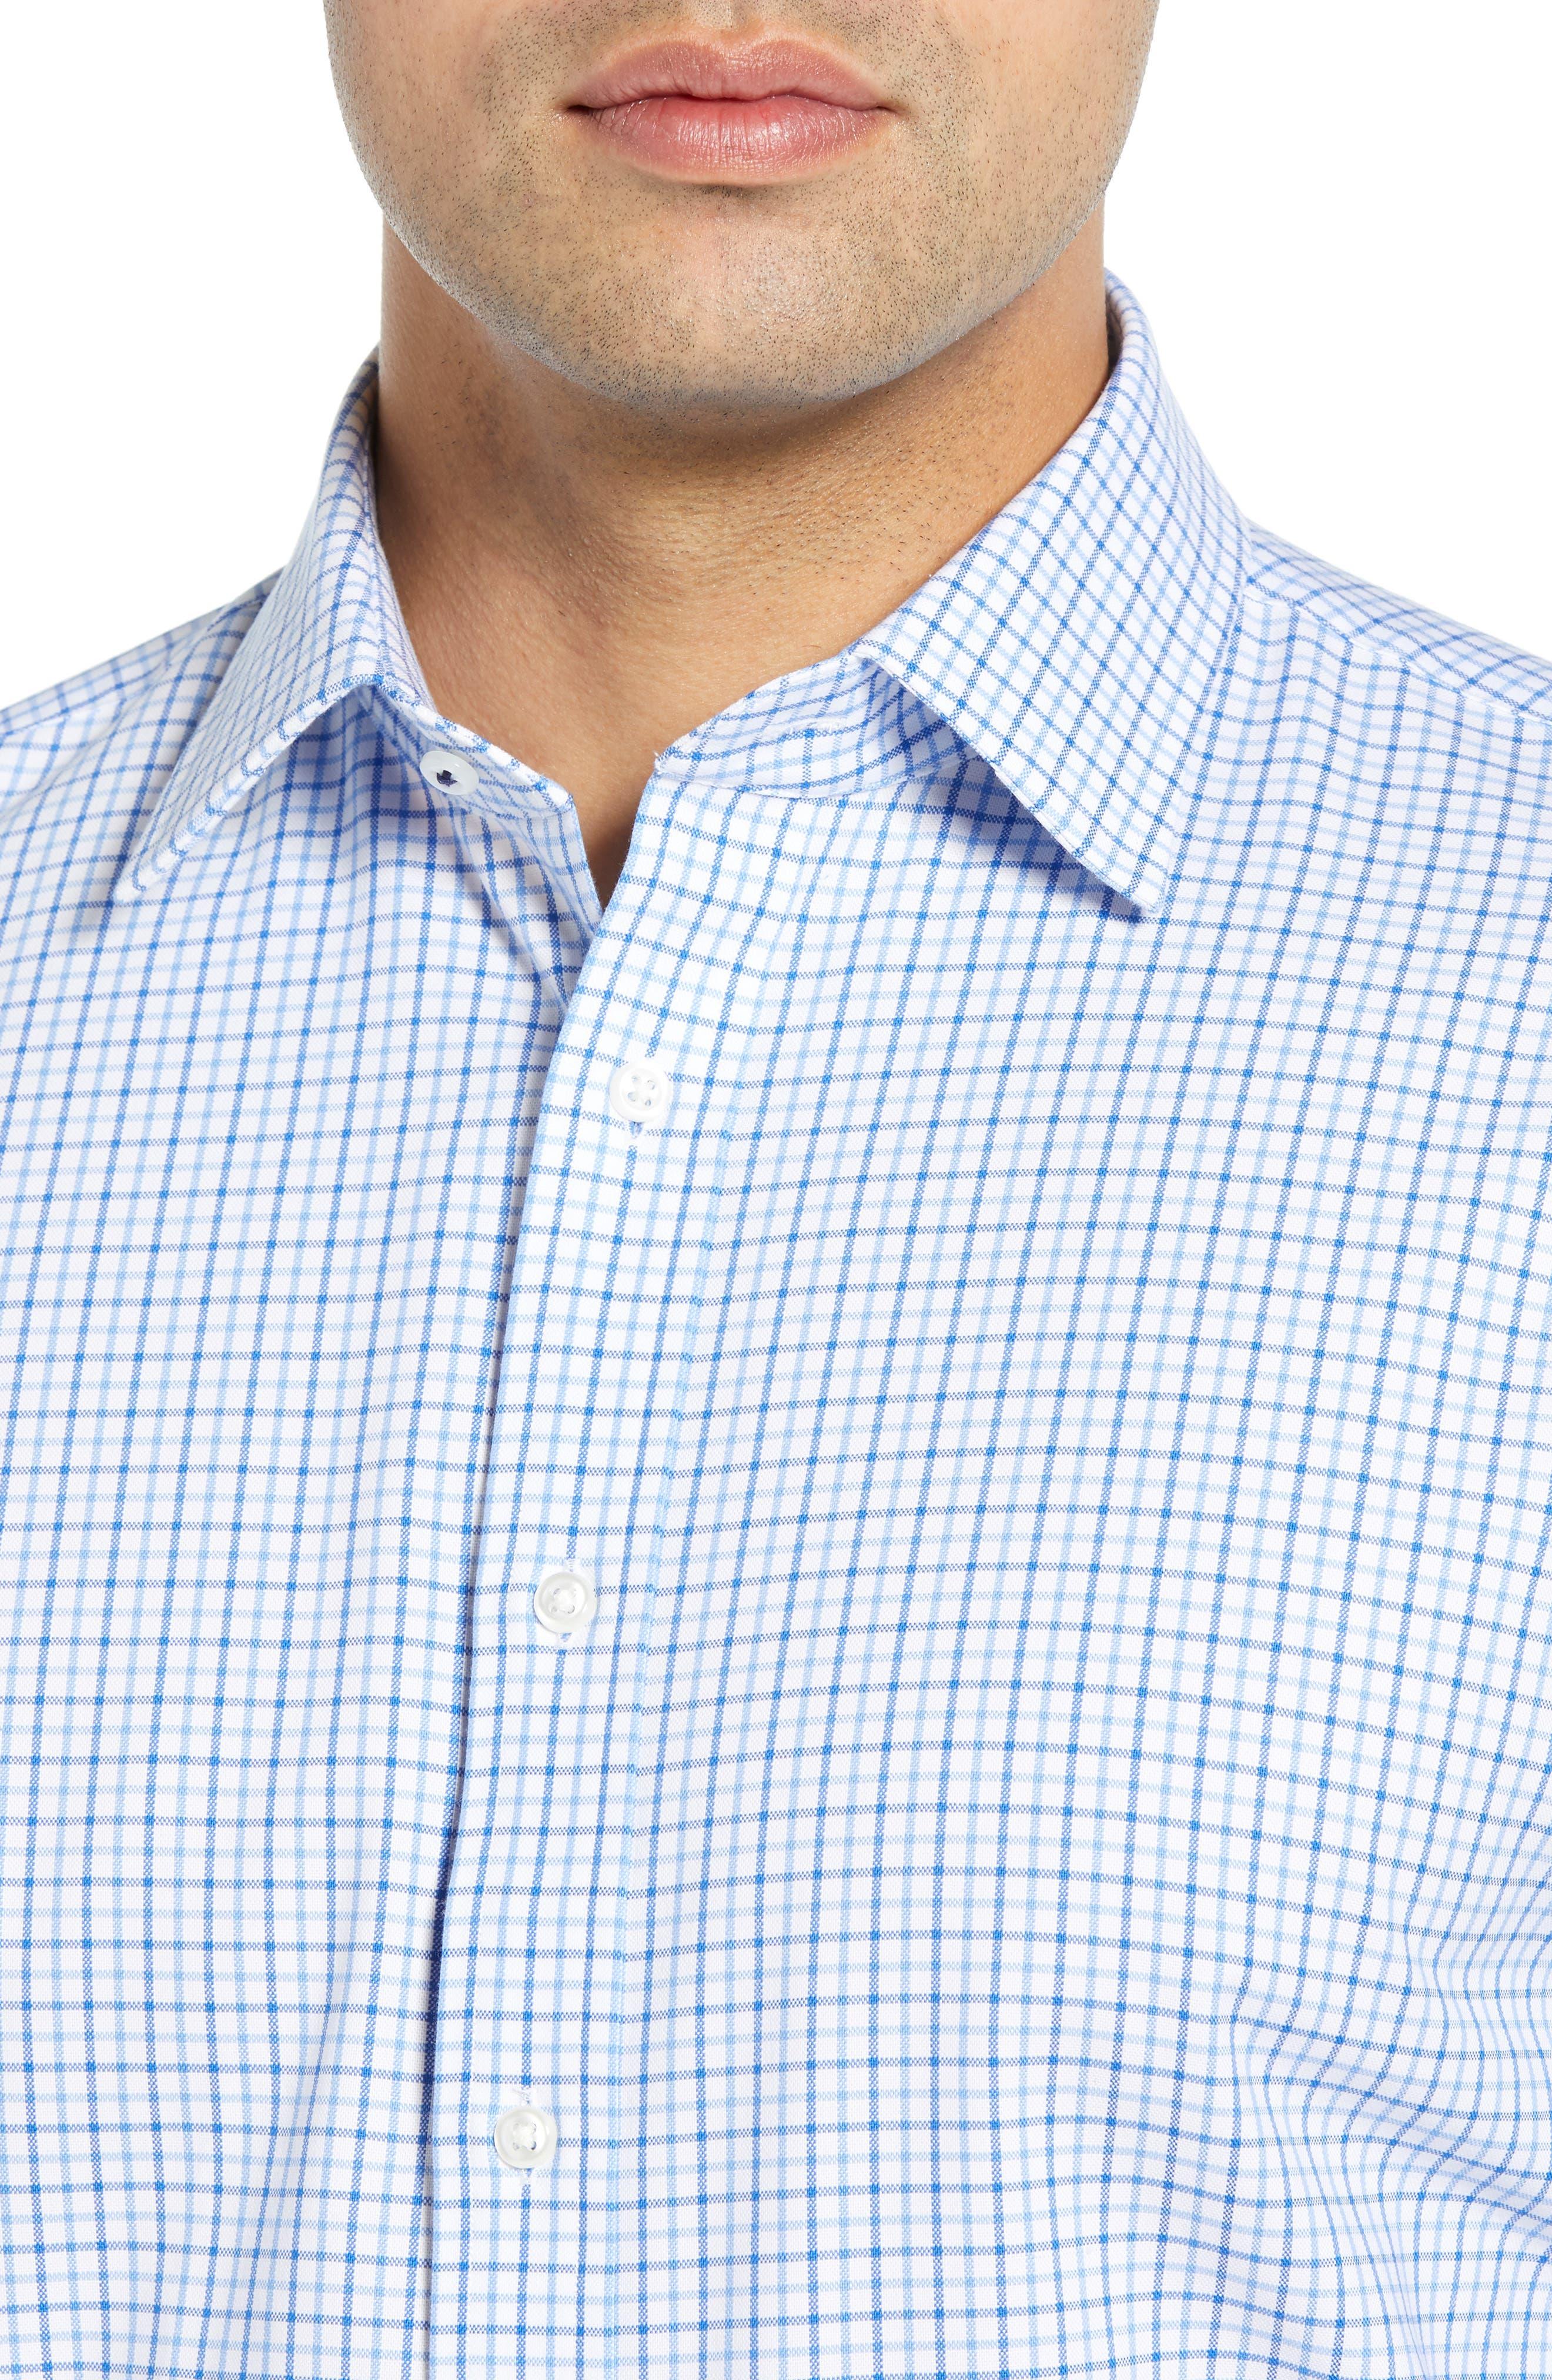 NORDSTROM MEN'S SHOP,                             Tech-Smart Traditional Fit Check Stretch Dress Shirt,                             Alternate thumbnail 2, color,                             BLUE VICTORIA